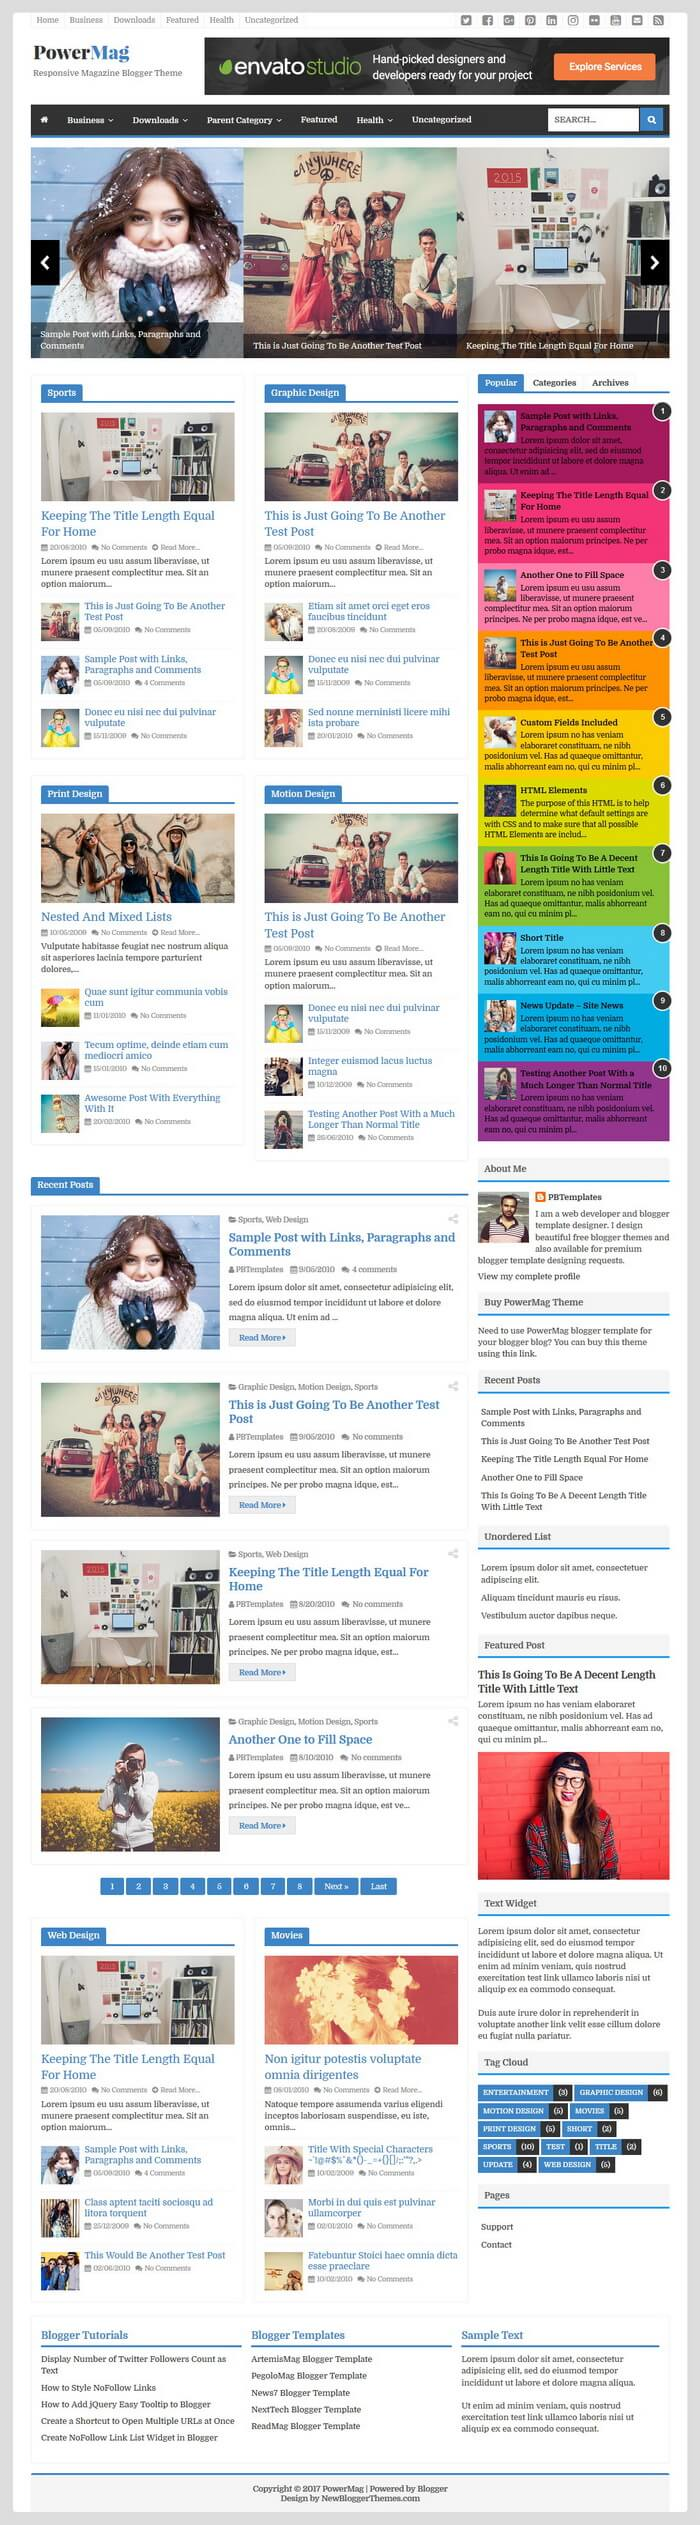 PowerMag Blogger Theme